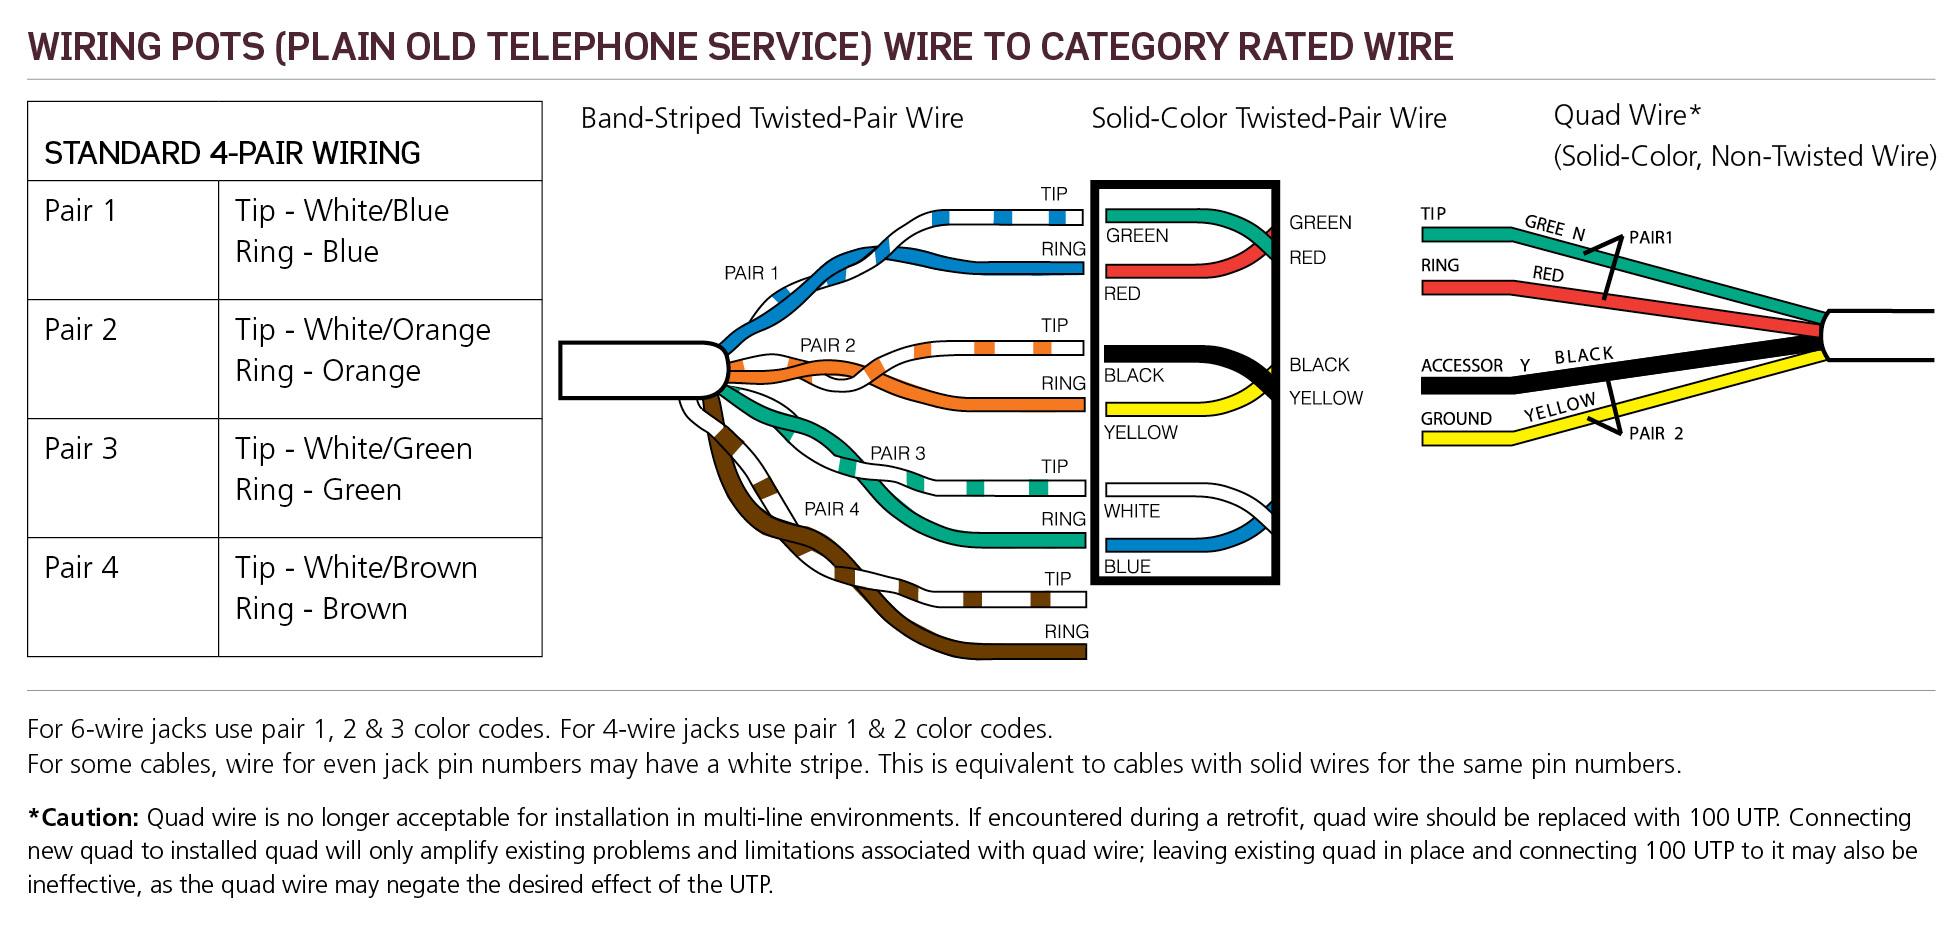 telephone ethernet hook up diagram wiring diagram schematics telephone hook up diagram phone jack wiring diagram [ 1960 x 936 Pixel ]